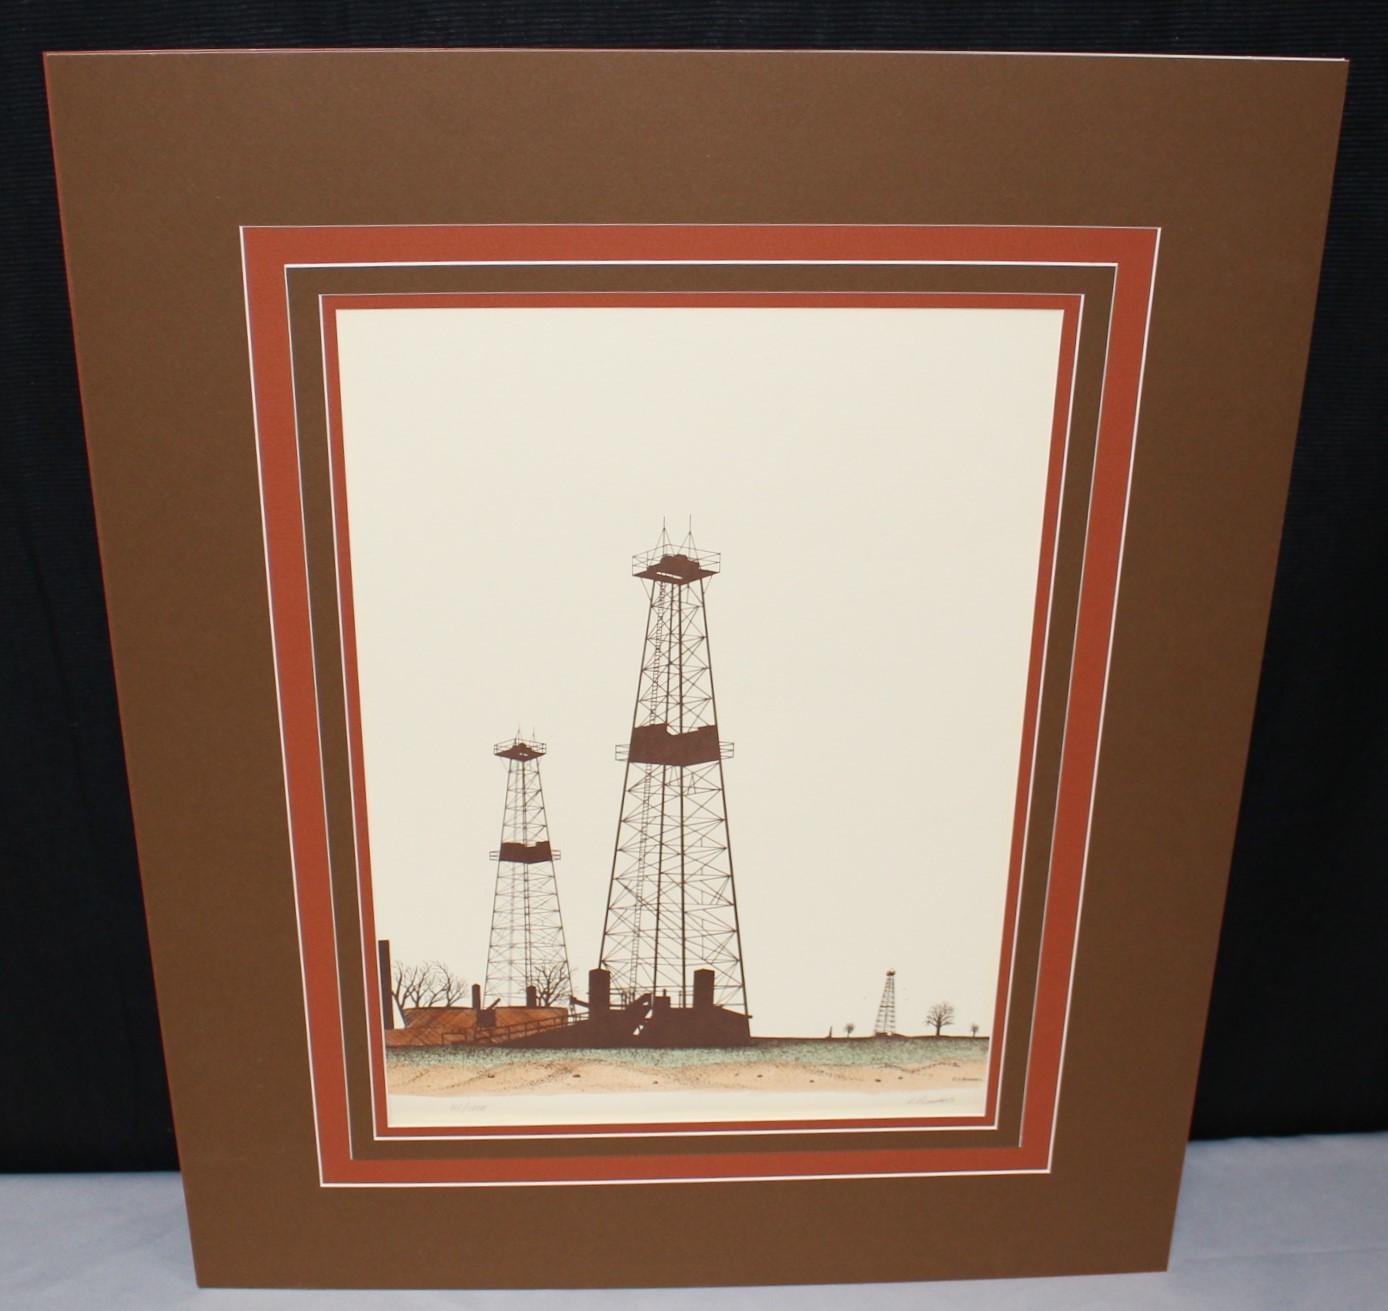 R. Bumpass Oil Derrick Well Pump Petroleum Color Lithograph Signed & Numbered